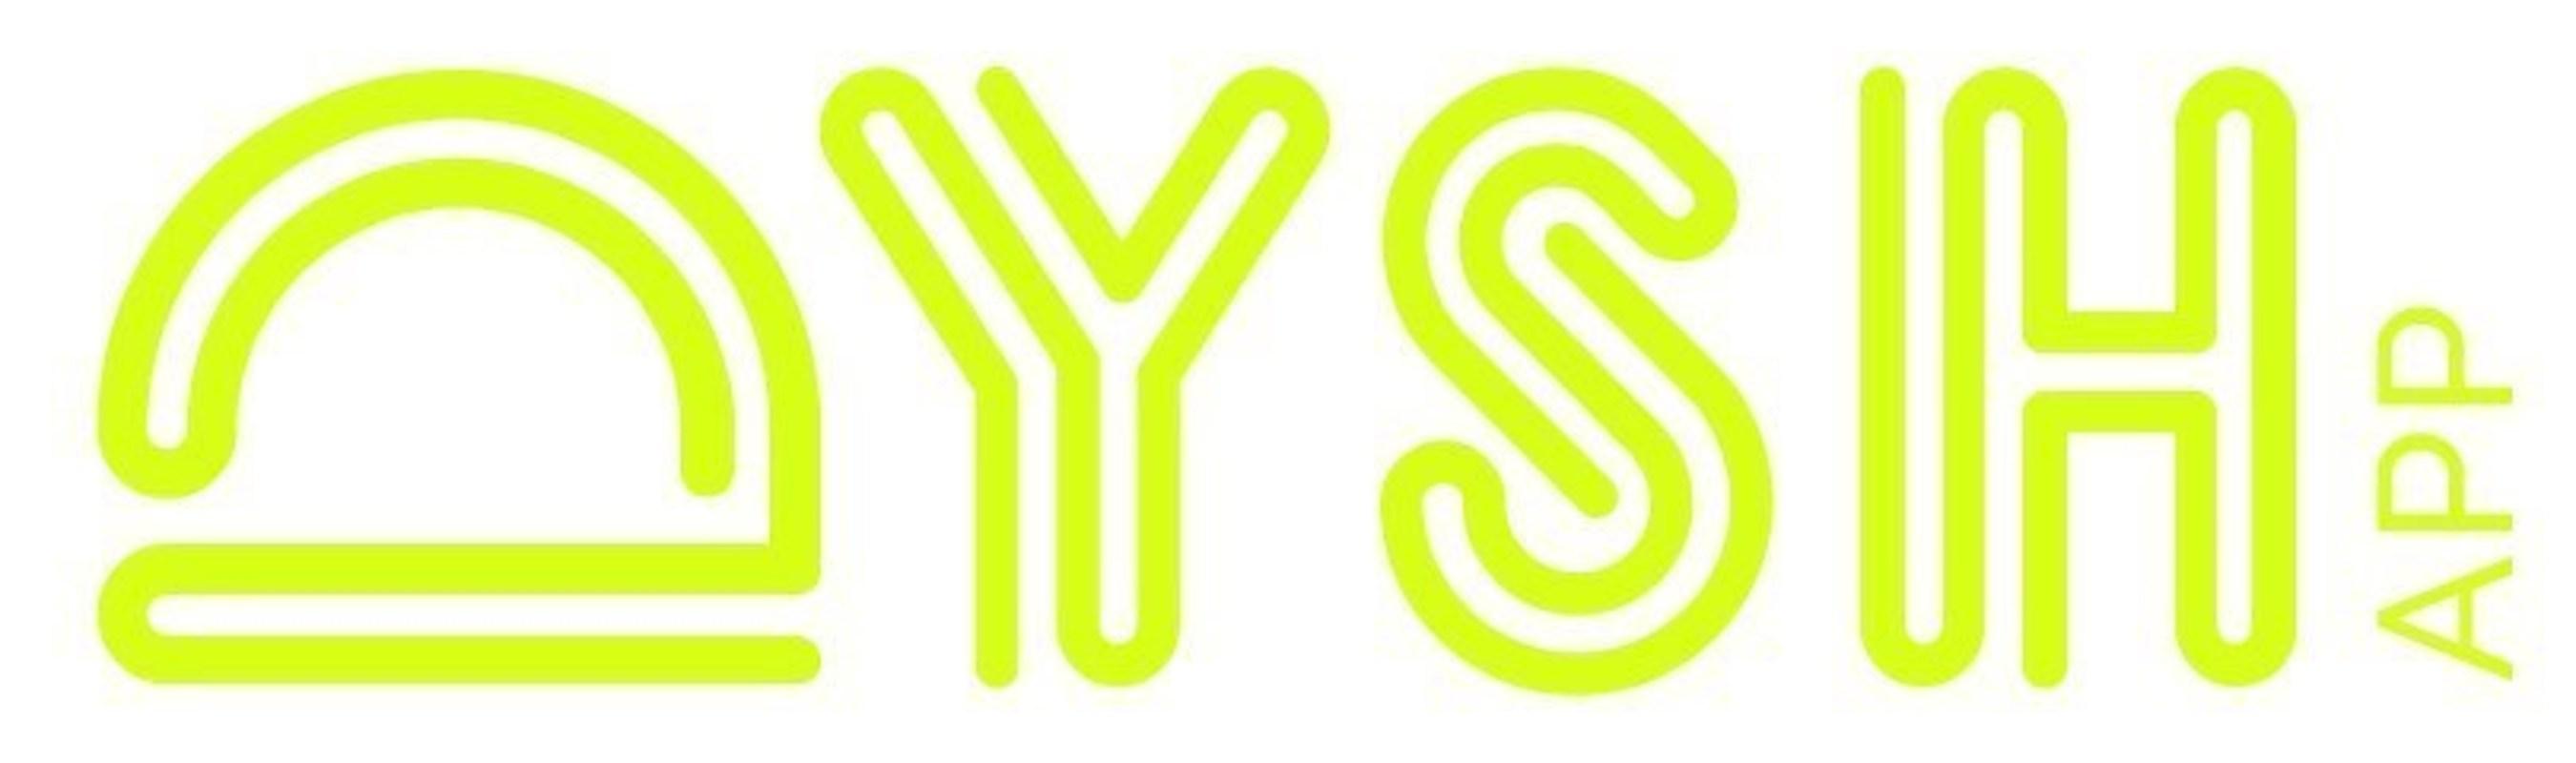 Dysh app company logo (PRNewsFoto/Toast Labs, Inc.)